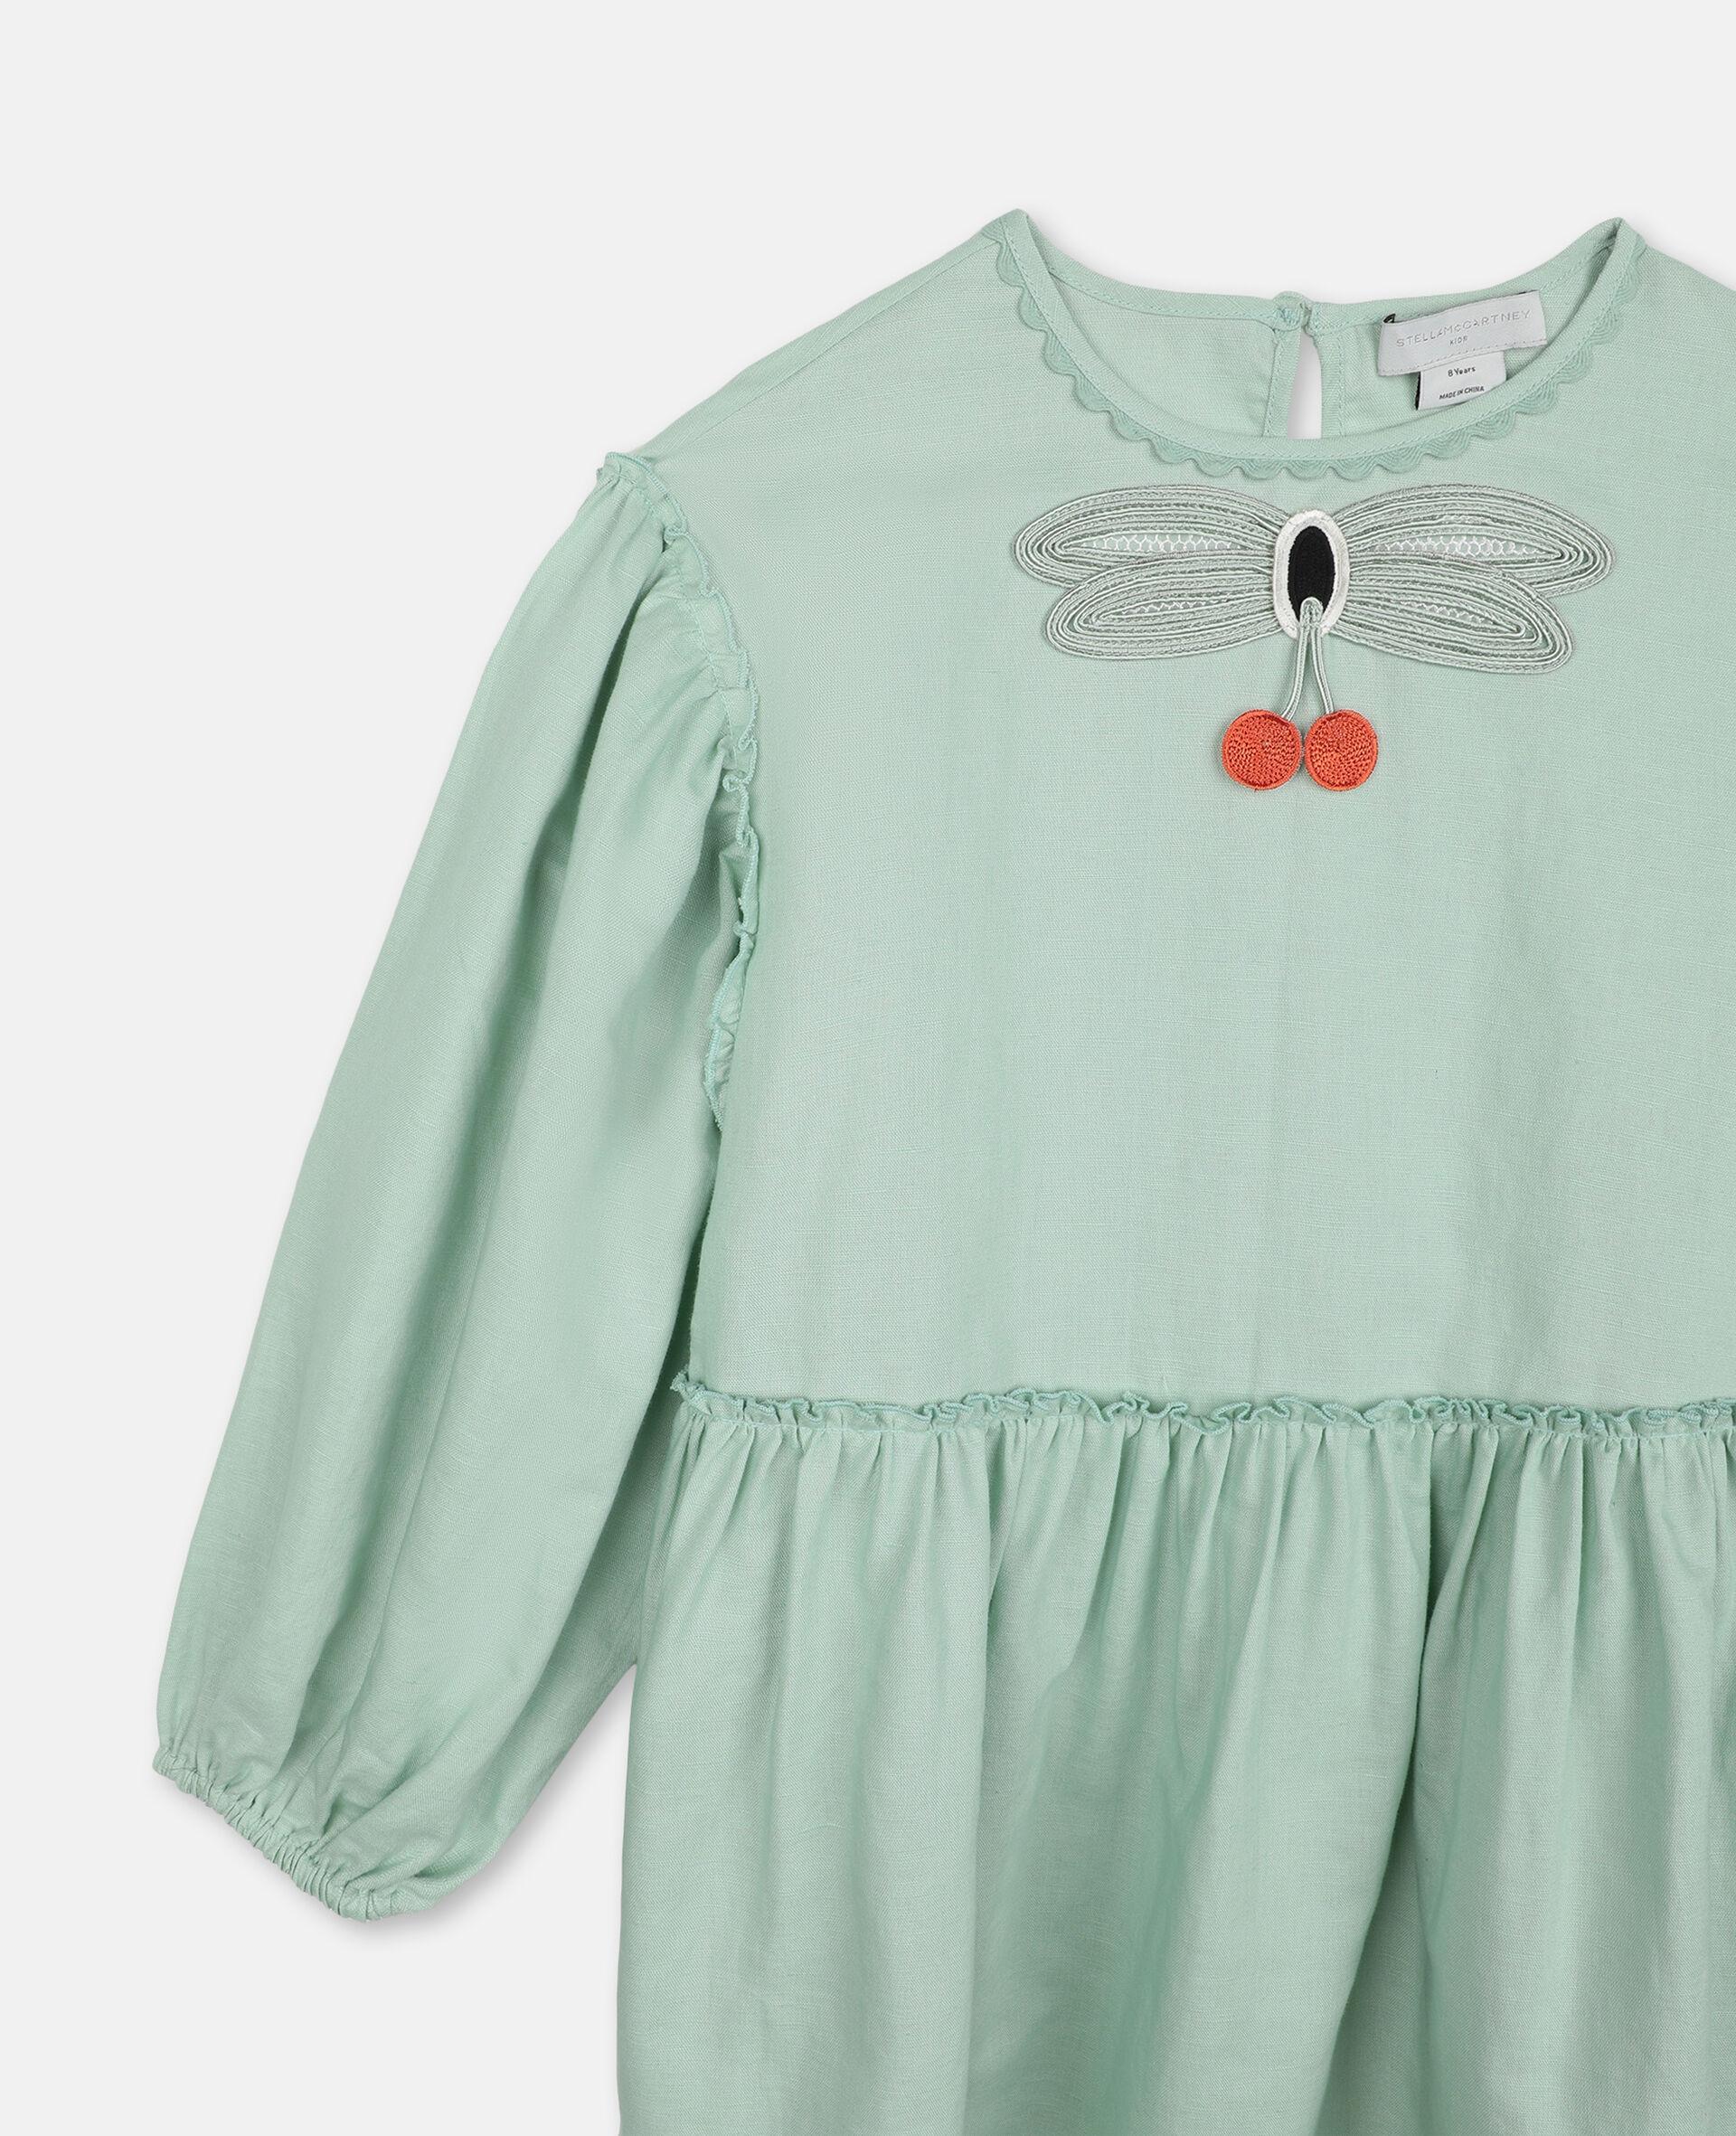 Kleid mit Schmetterling-Borte-Grün-large image number 1